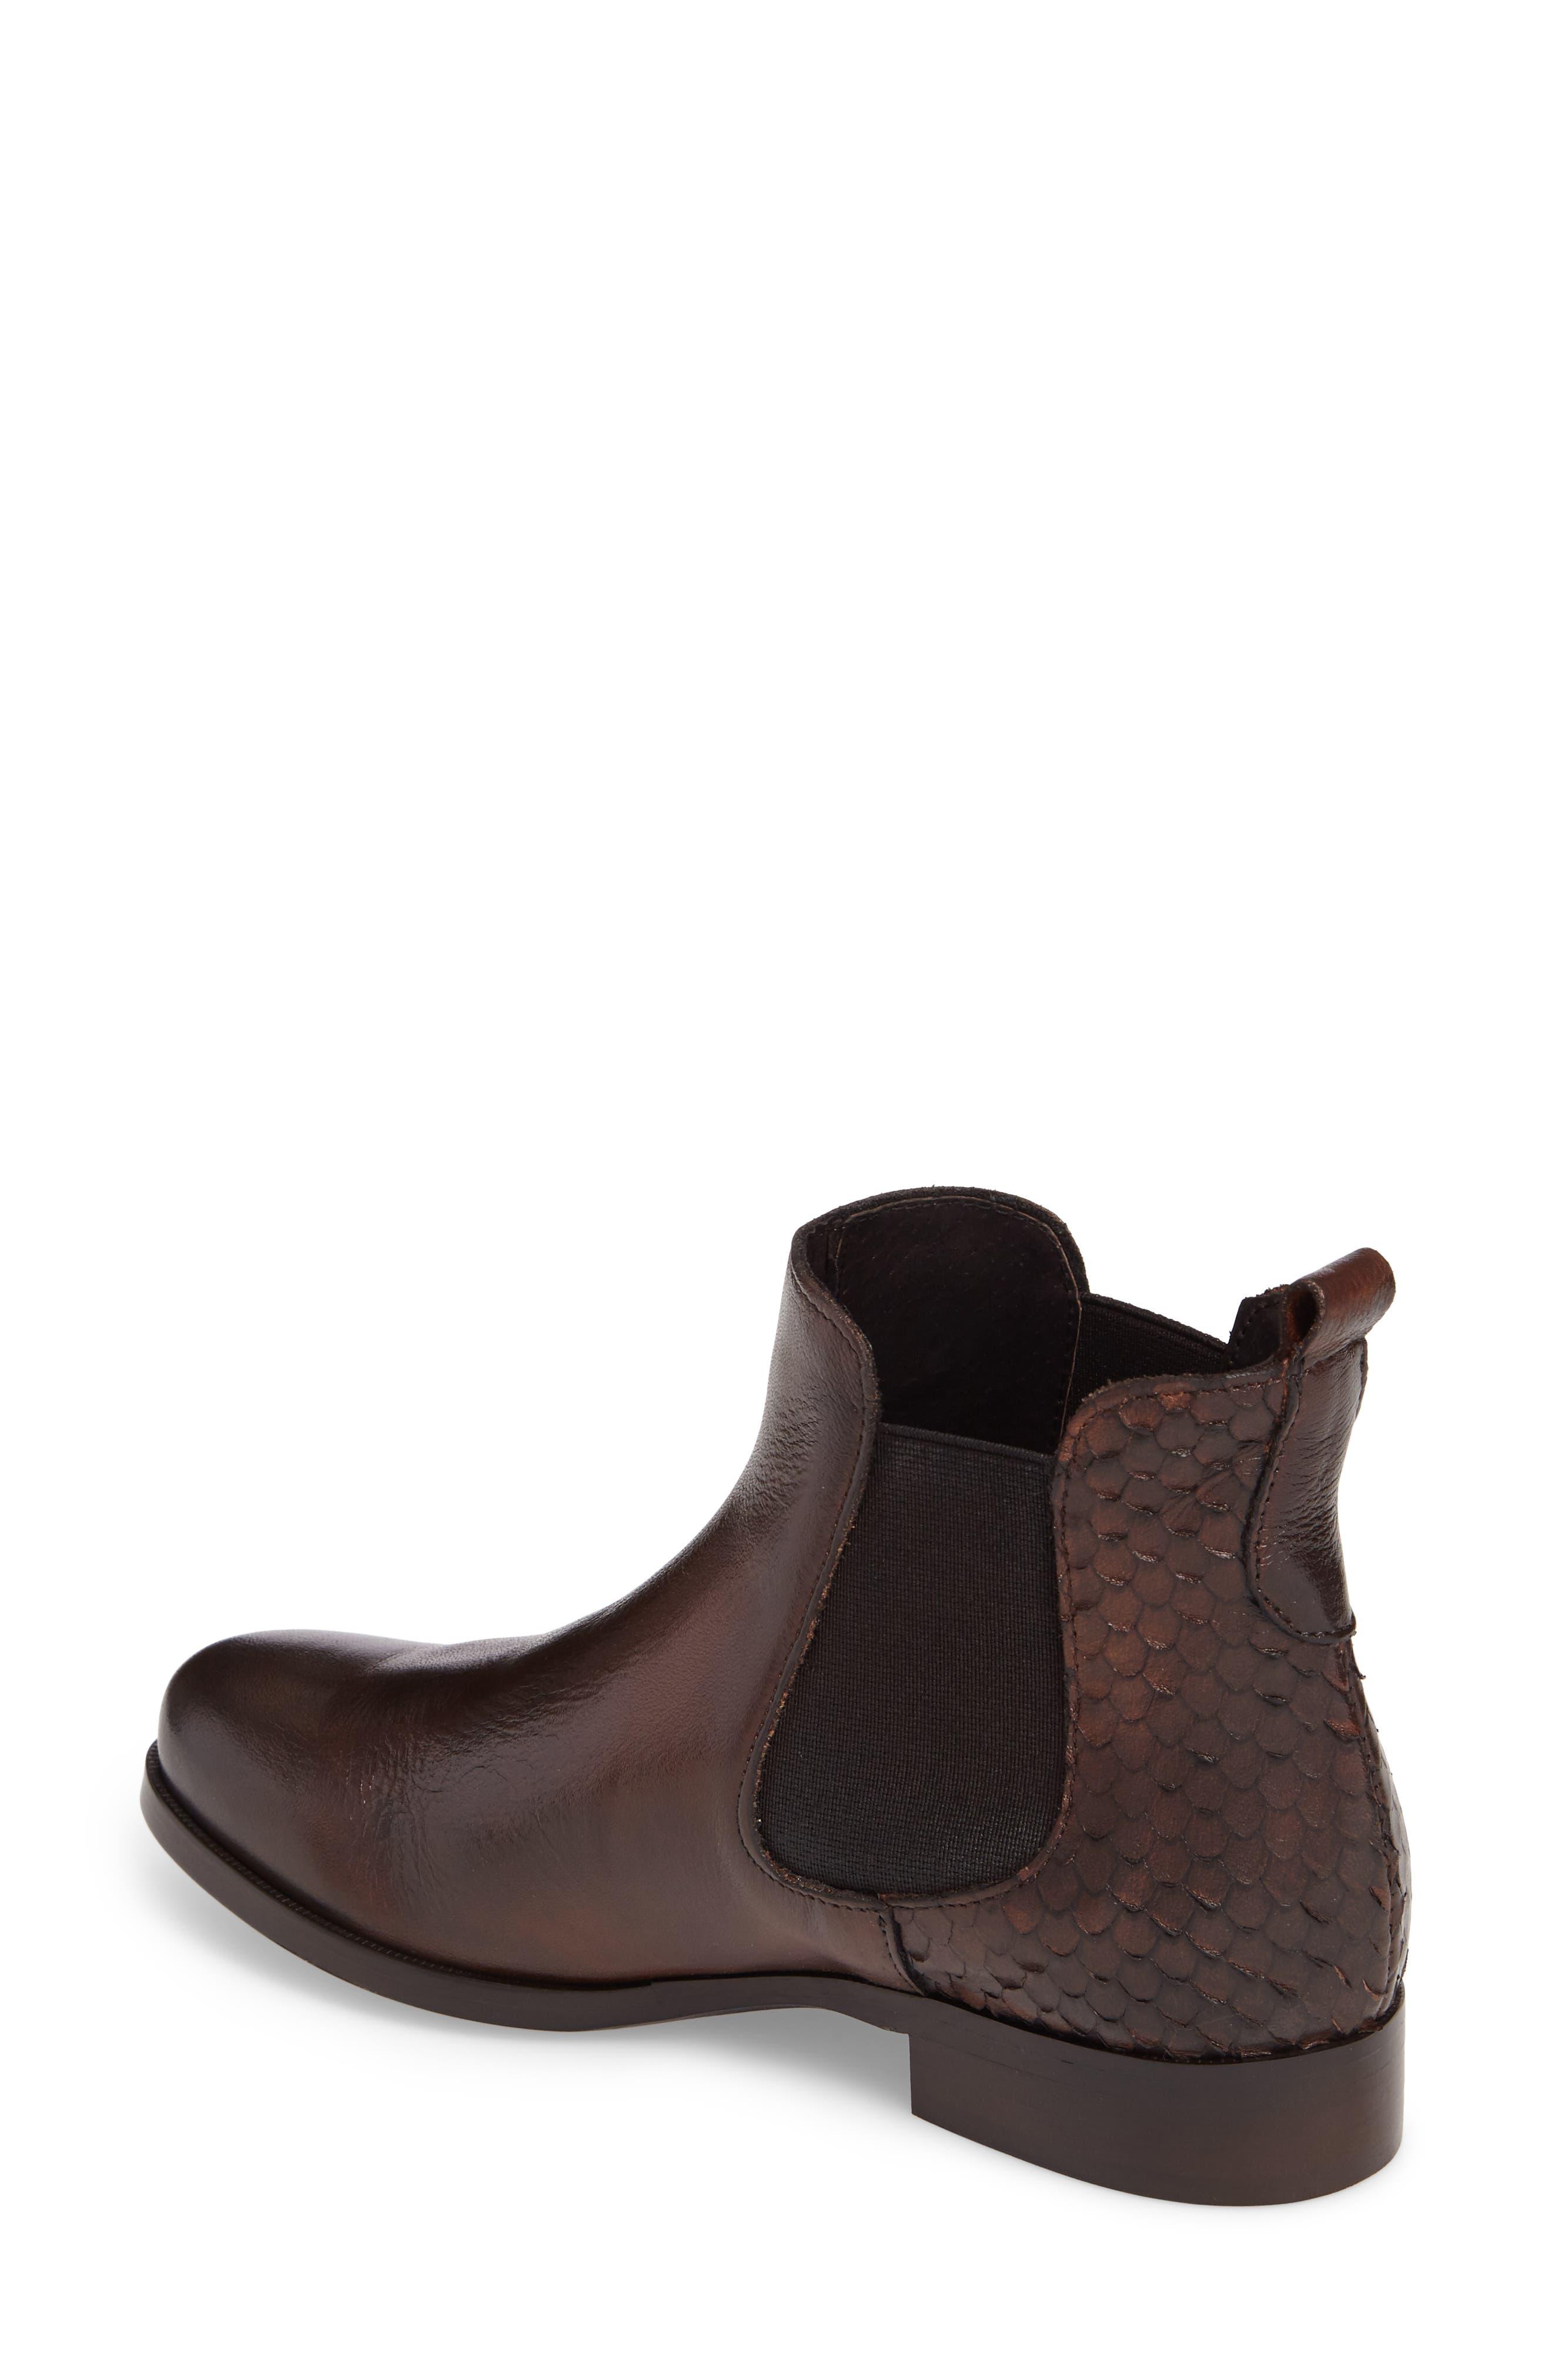 Padamae Water Resistant Chelsea Boot,                             Alternate thumbnail 2, color,                             Onyx Suede